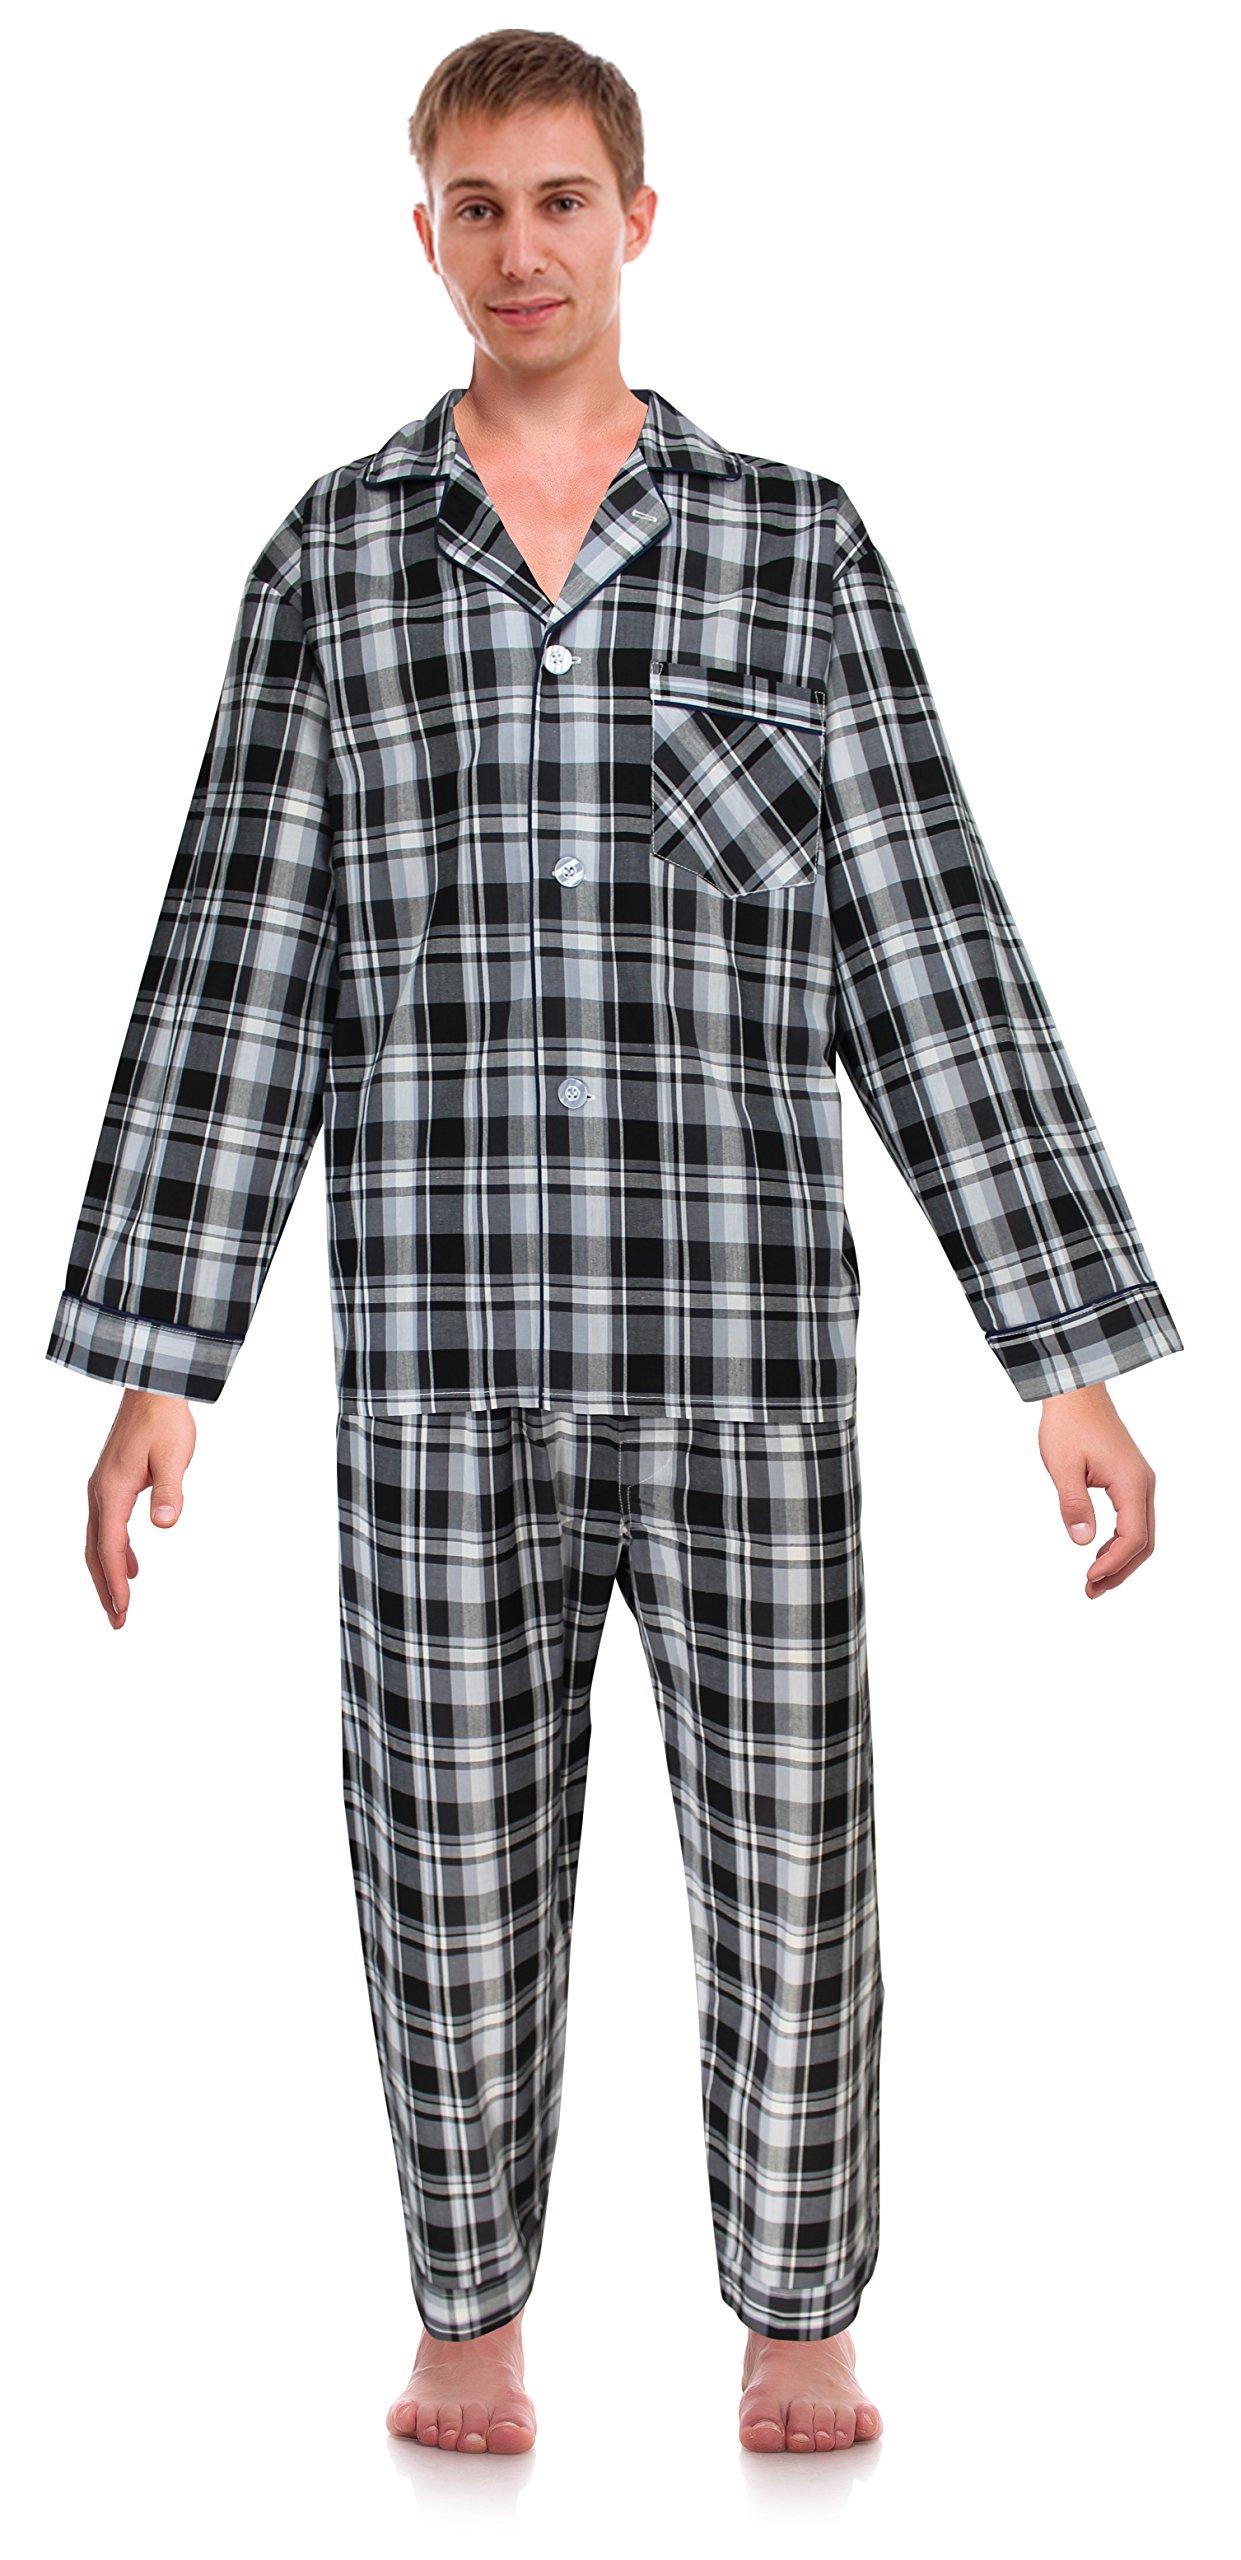 RK Classical Sleepwear Men's Broadcloth Woven Pajama Set, Size XXX-Large